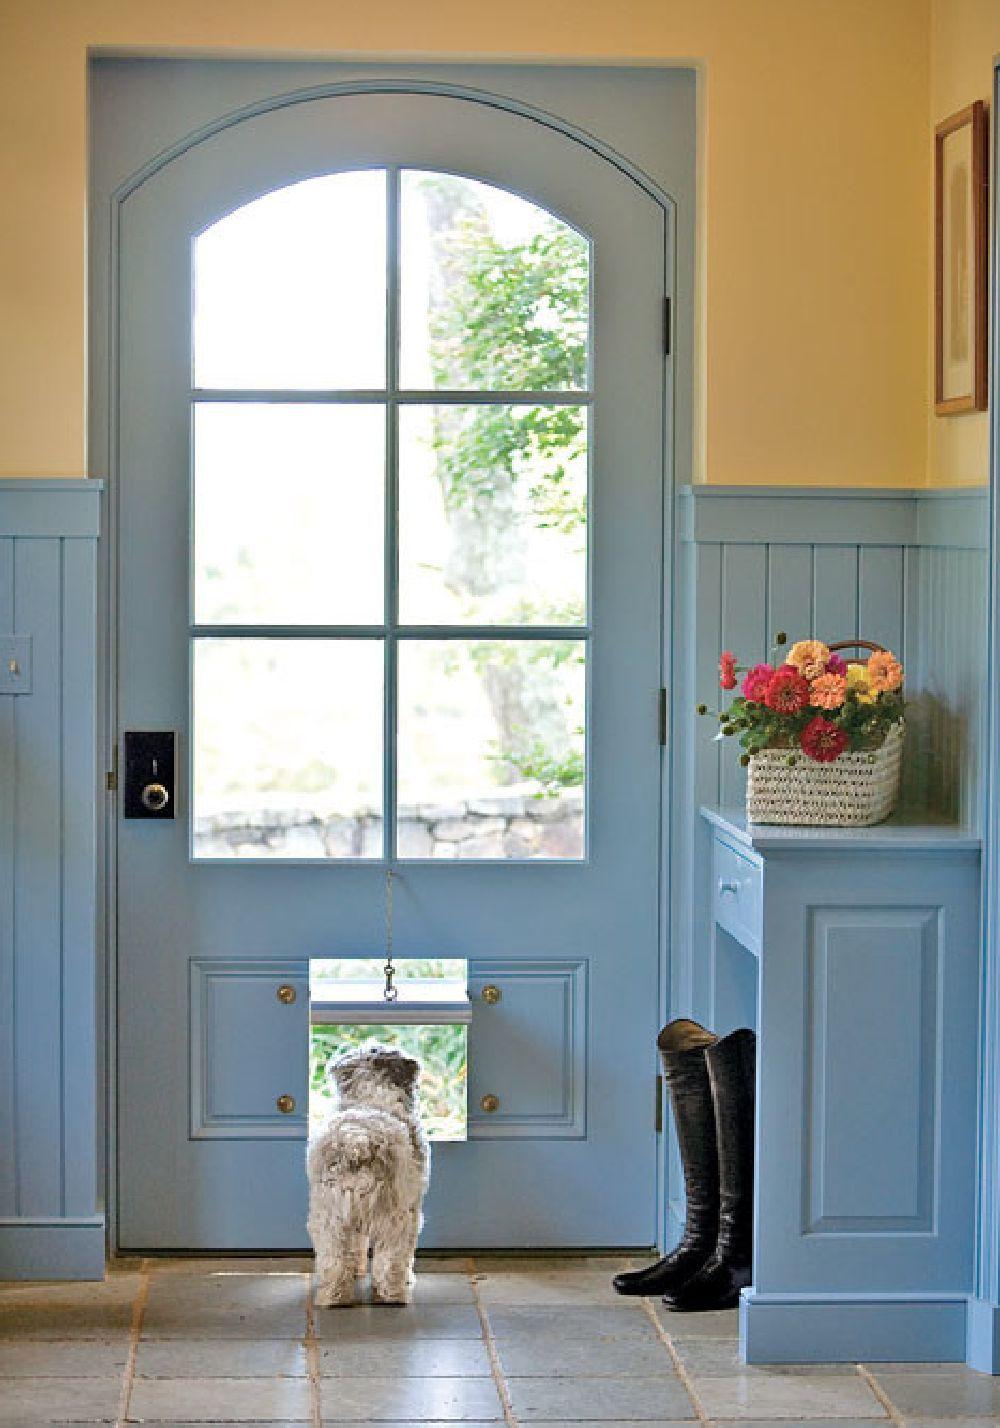 adelaparvu.com despre casa in stil provence, arh Mark Buchanan, design interior Sgoshana Datlow, Foto Ron Blunt (16)